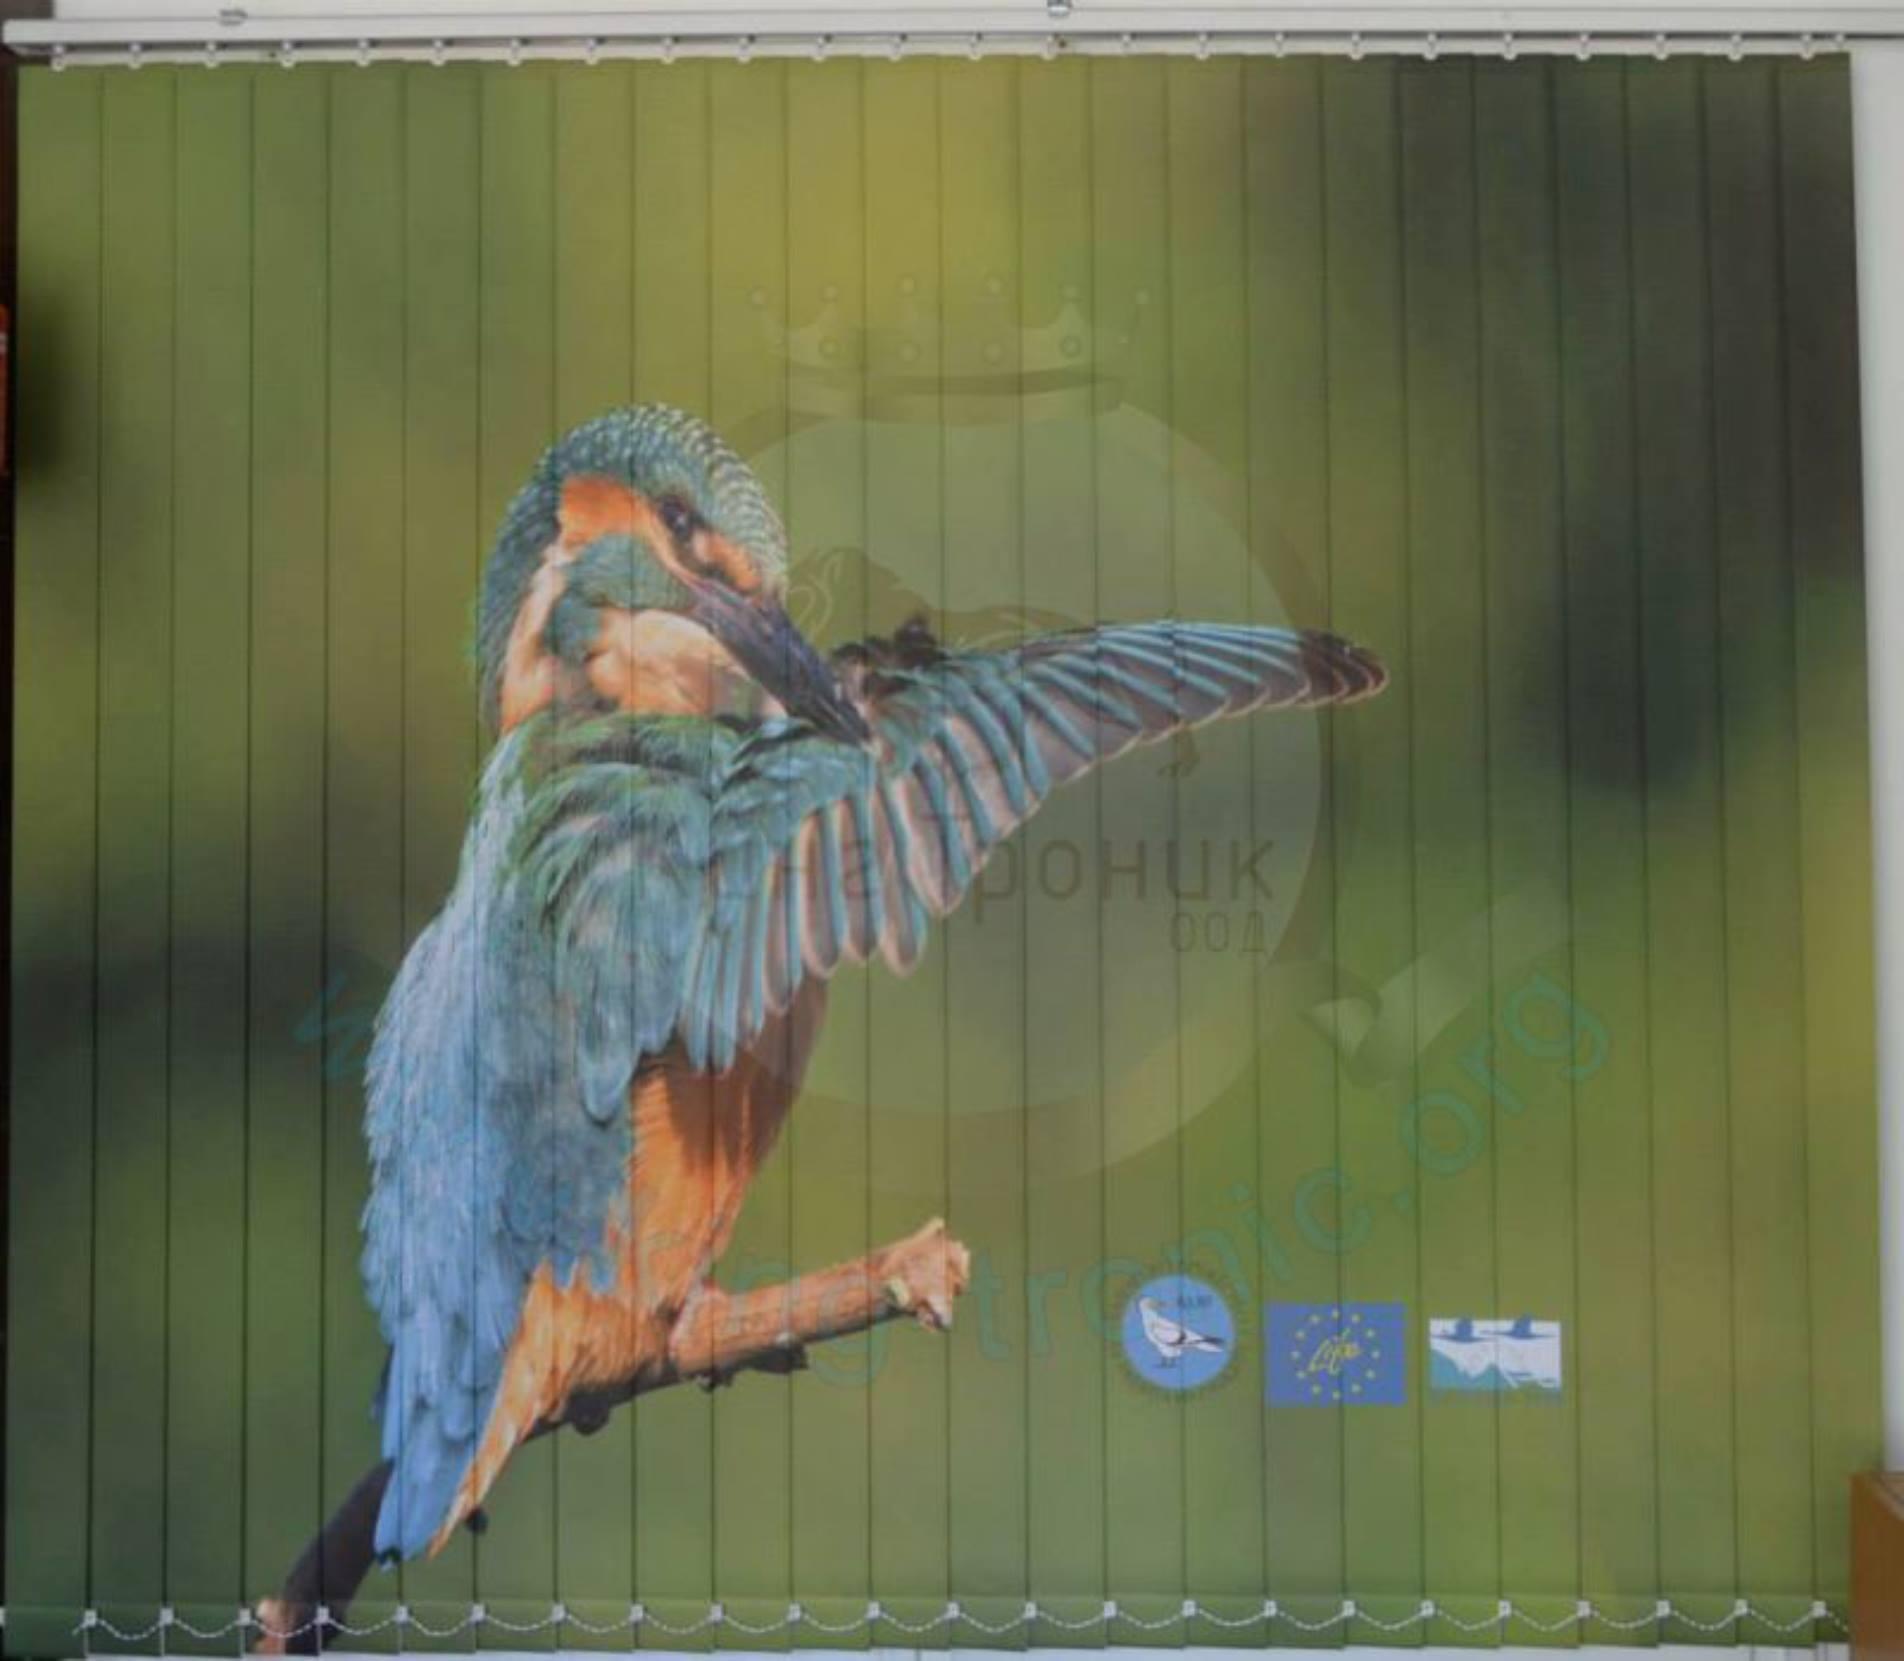 Вертикална фото щора - Индивидуален проект - Земеродно рибарче - Бургас!